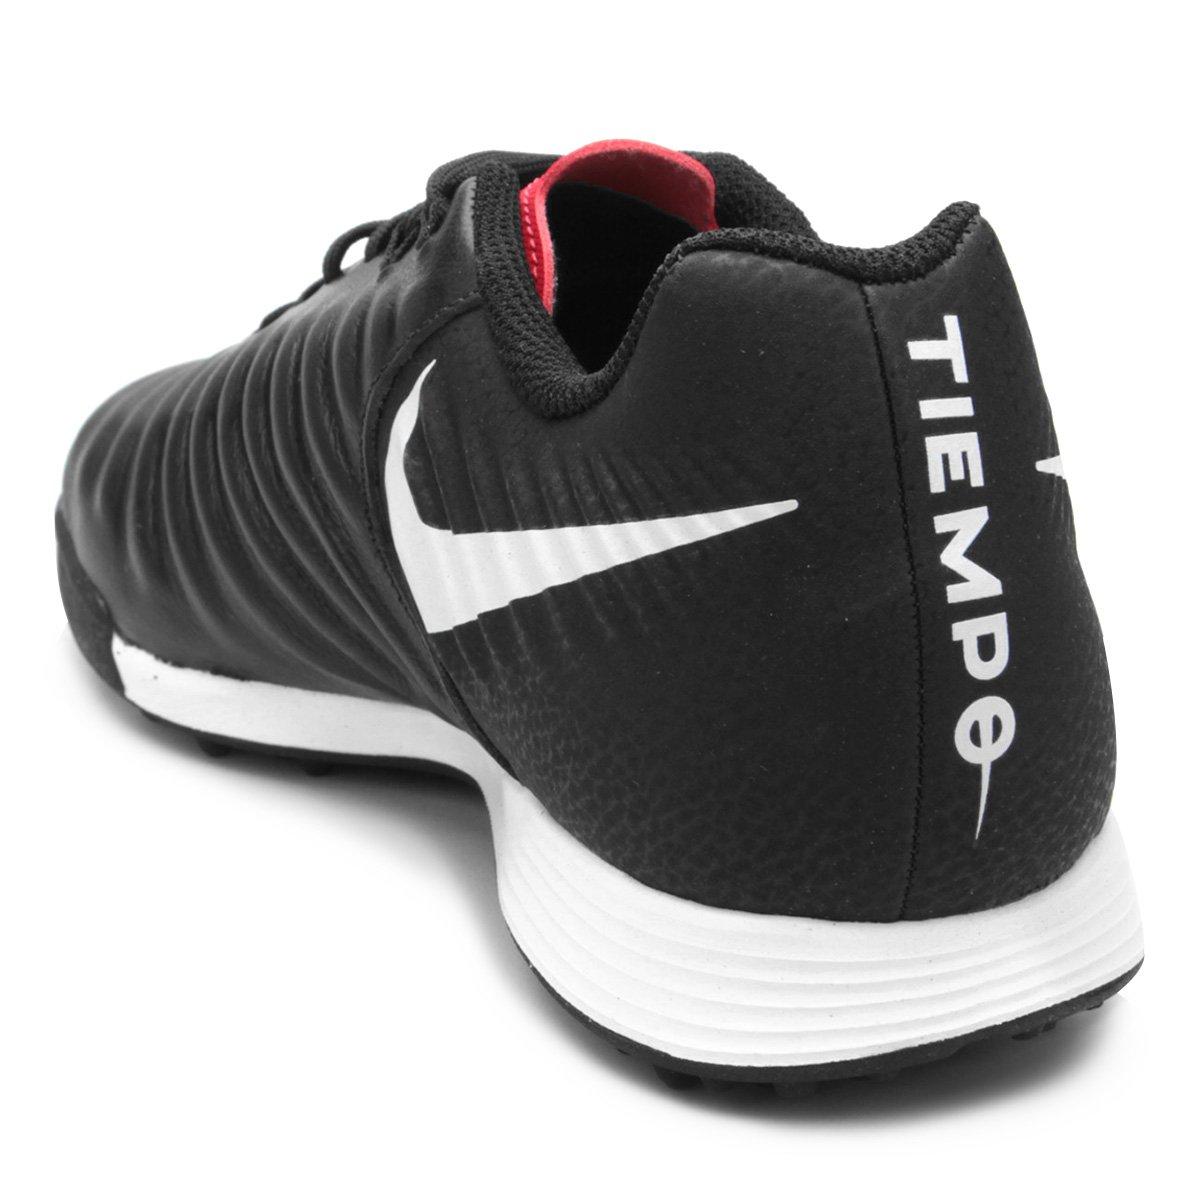 Chuteira Society Nike Tiempo Legend 7 Academy TF - Preto - Compre ... b9242c8d01704